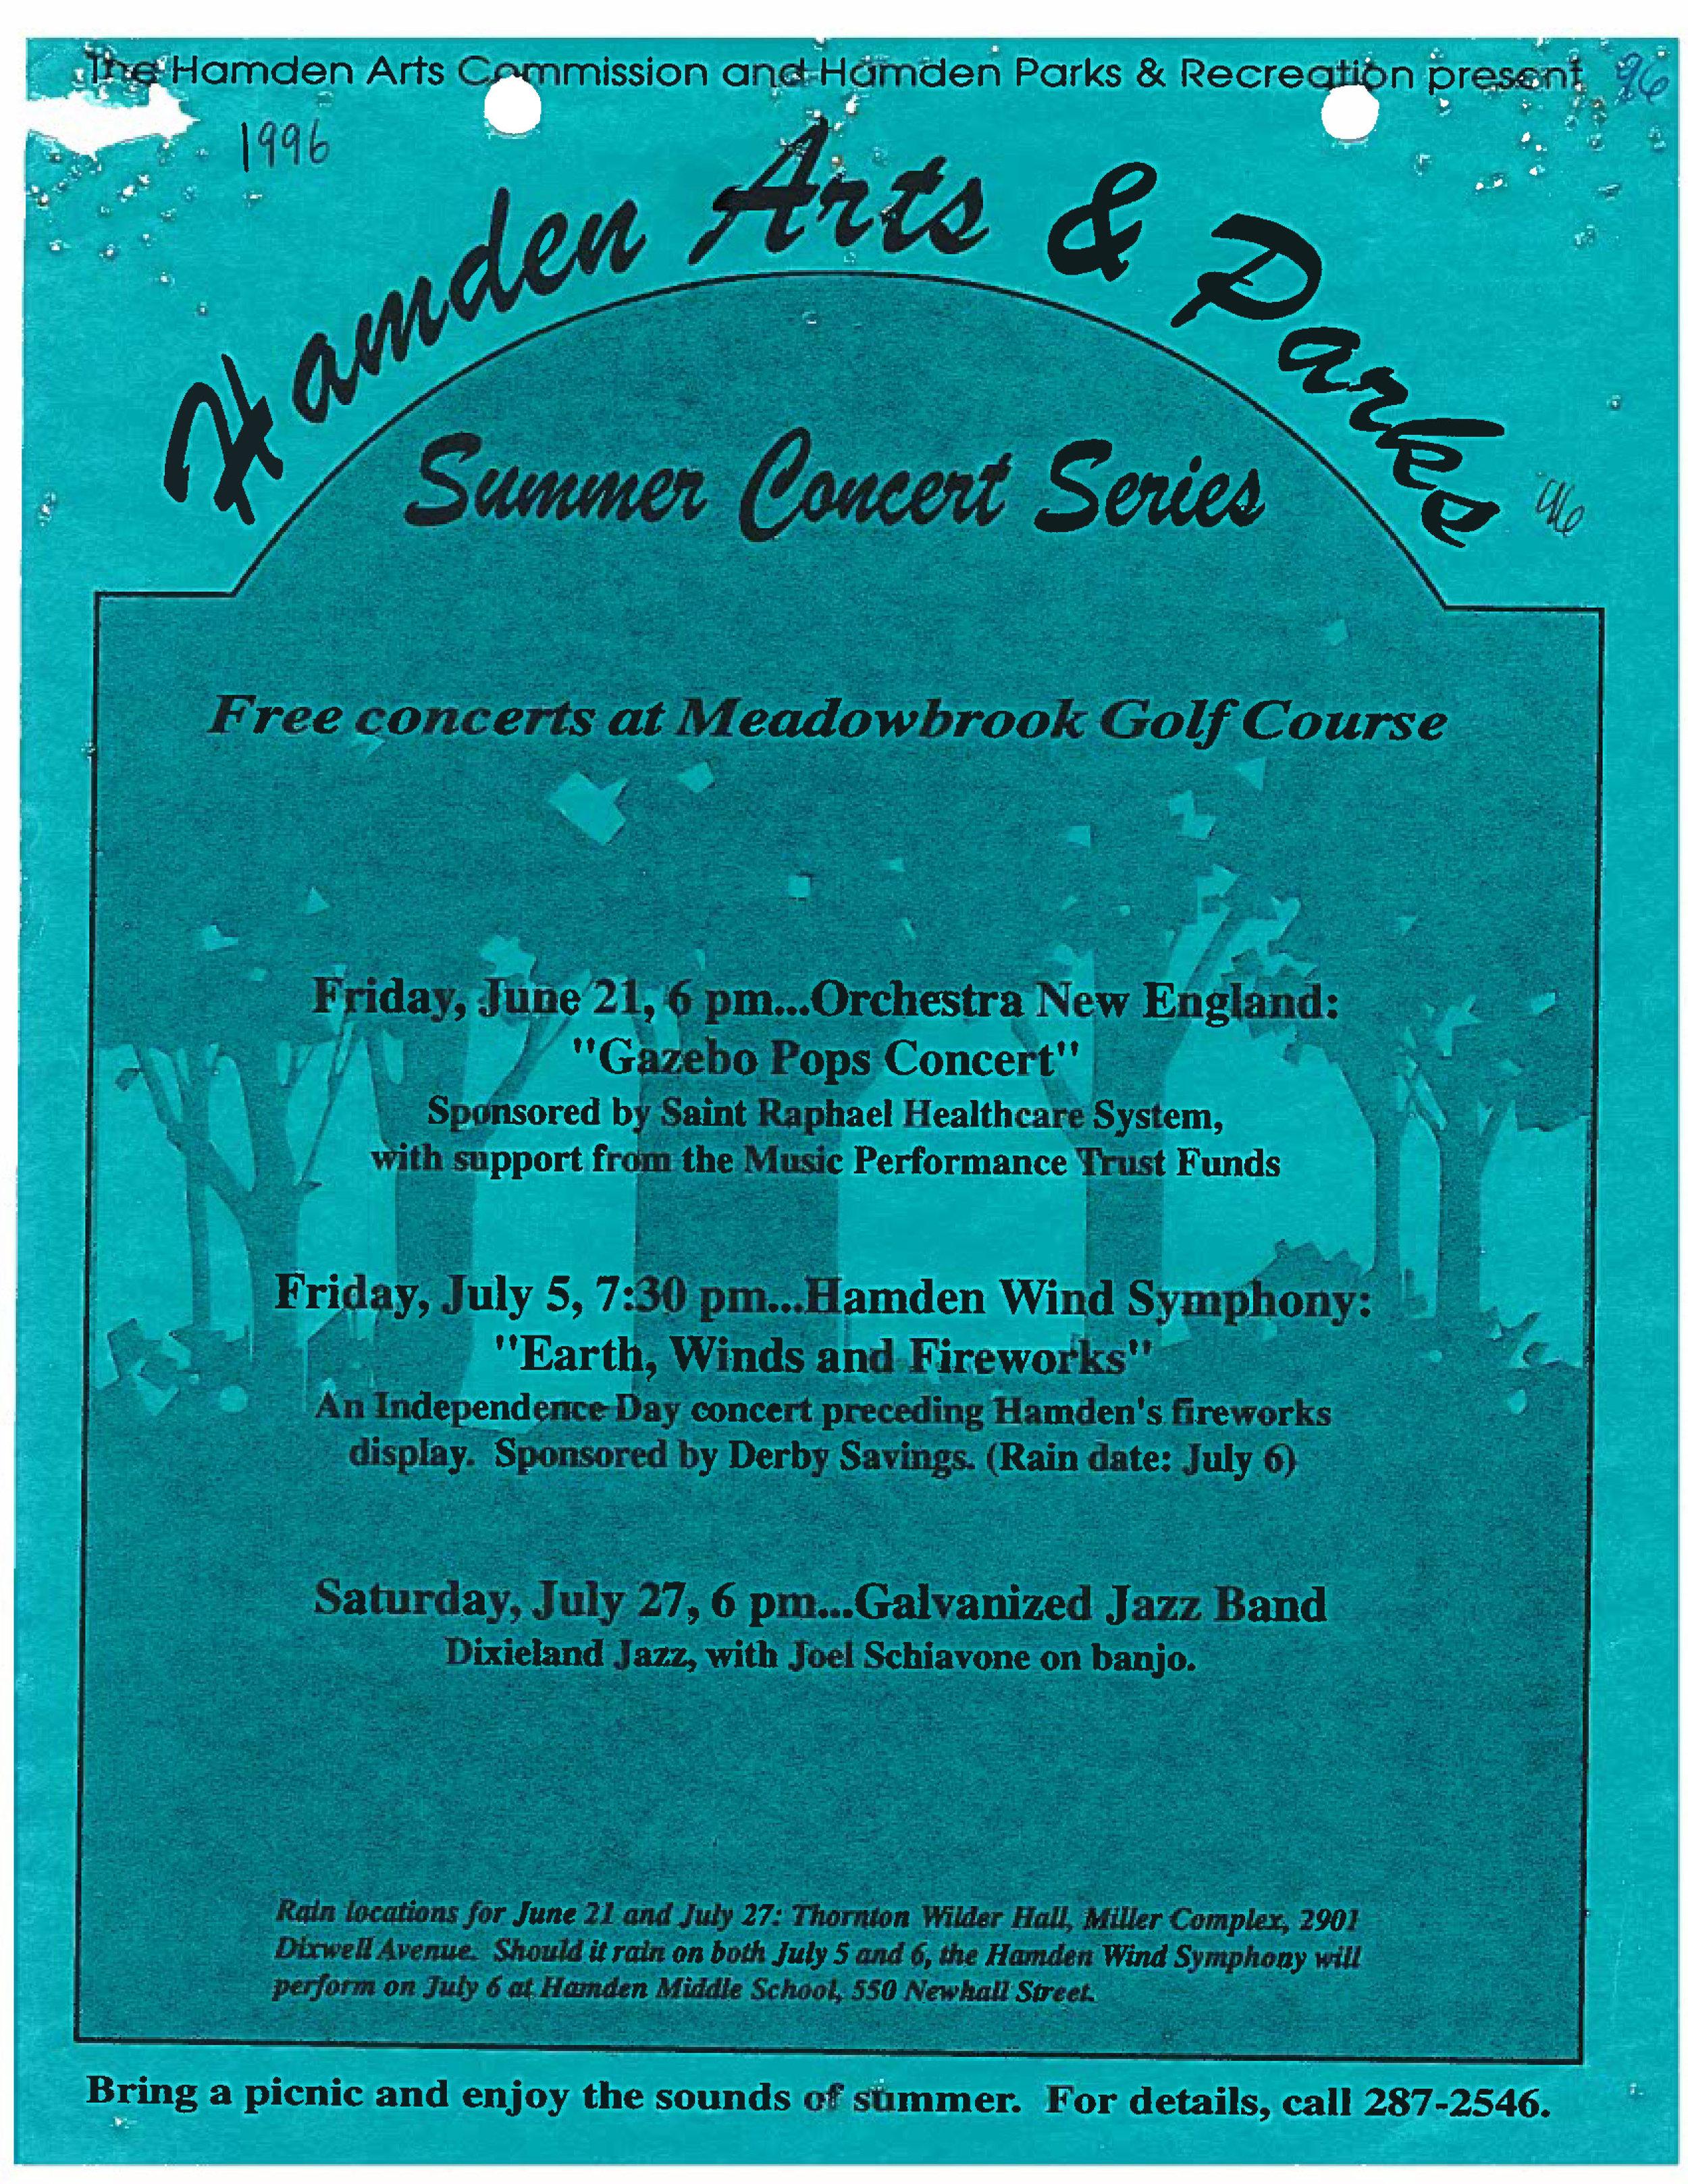 1996_Concerts Program.jpg